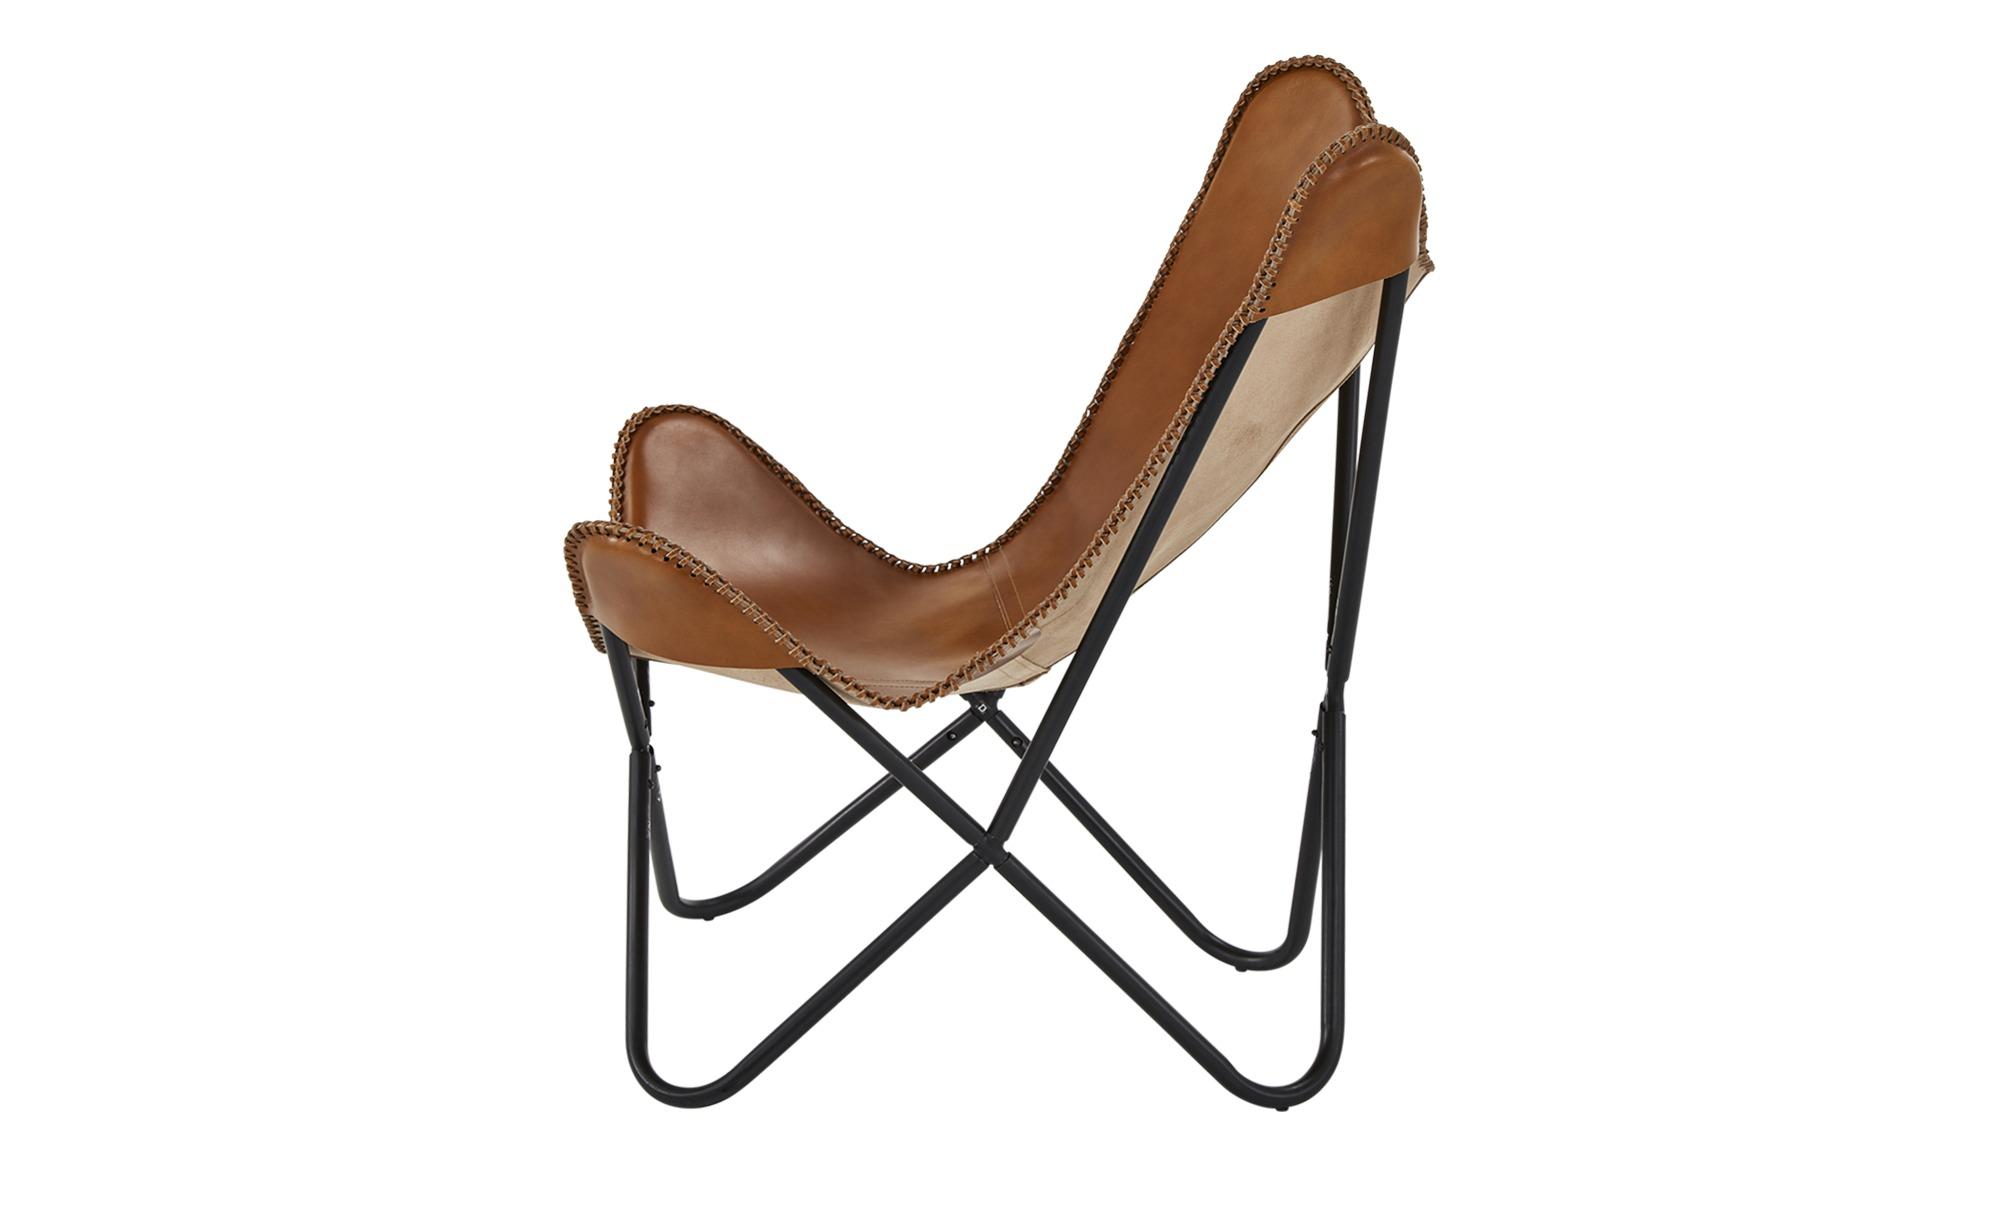 Schmetterlingssessel  Tristan ¦ braun ¦ Maße (cm): B: 76 H: 90 T: 68 Polstermöbel > Sessel > Ledersessel - Höffner